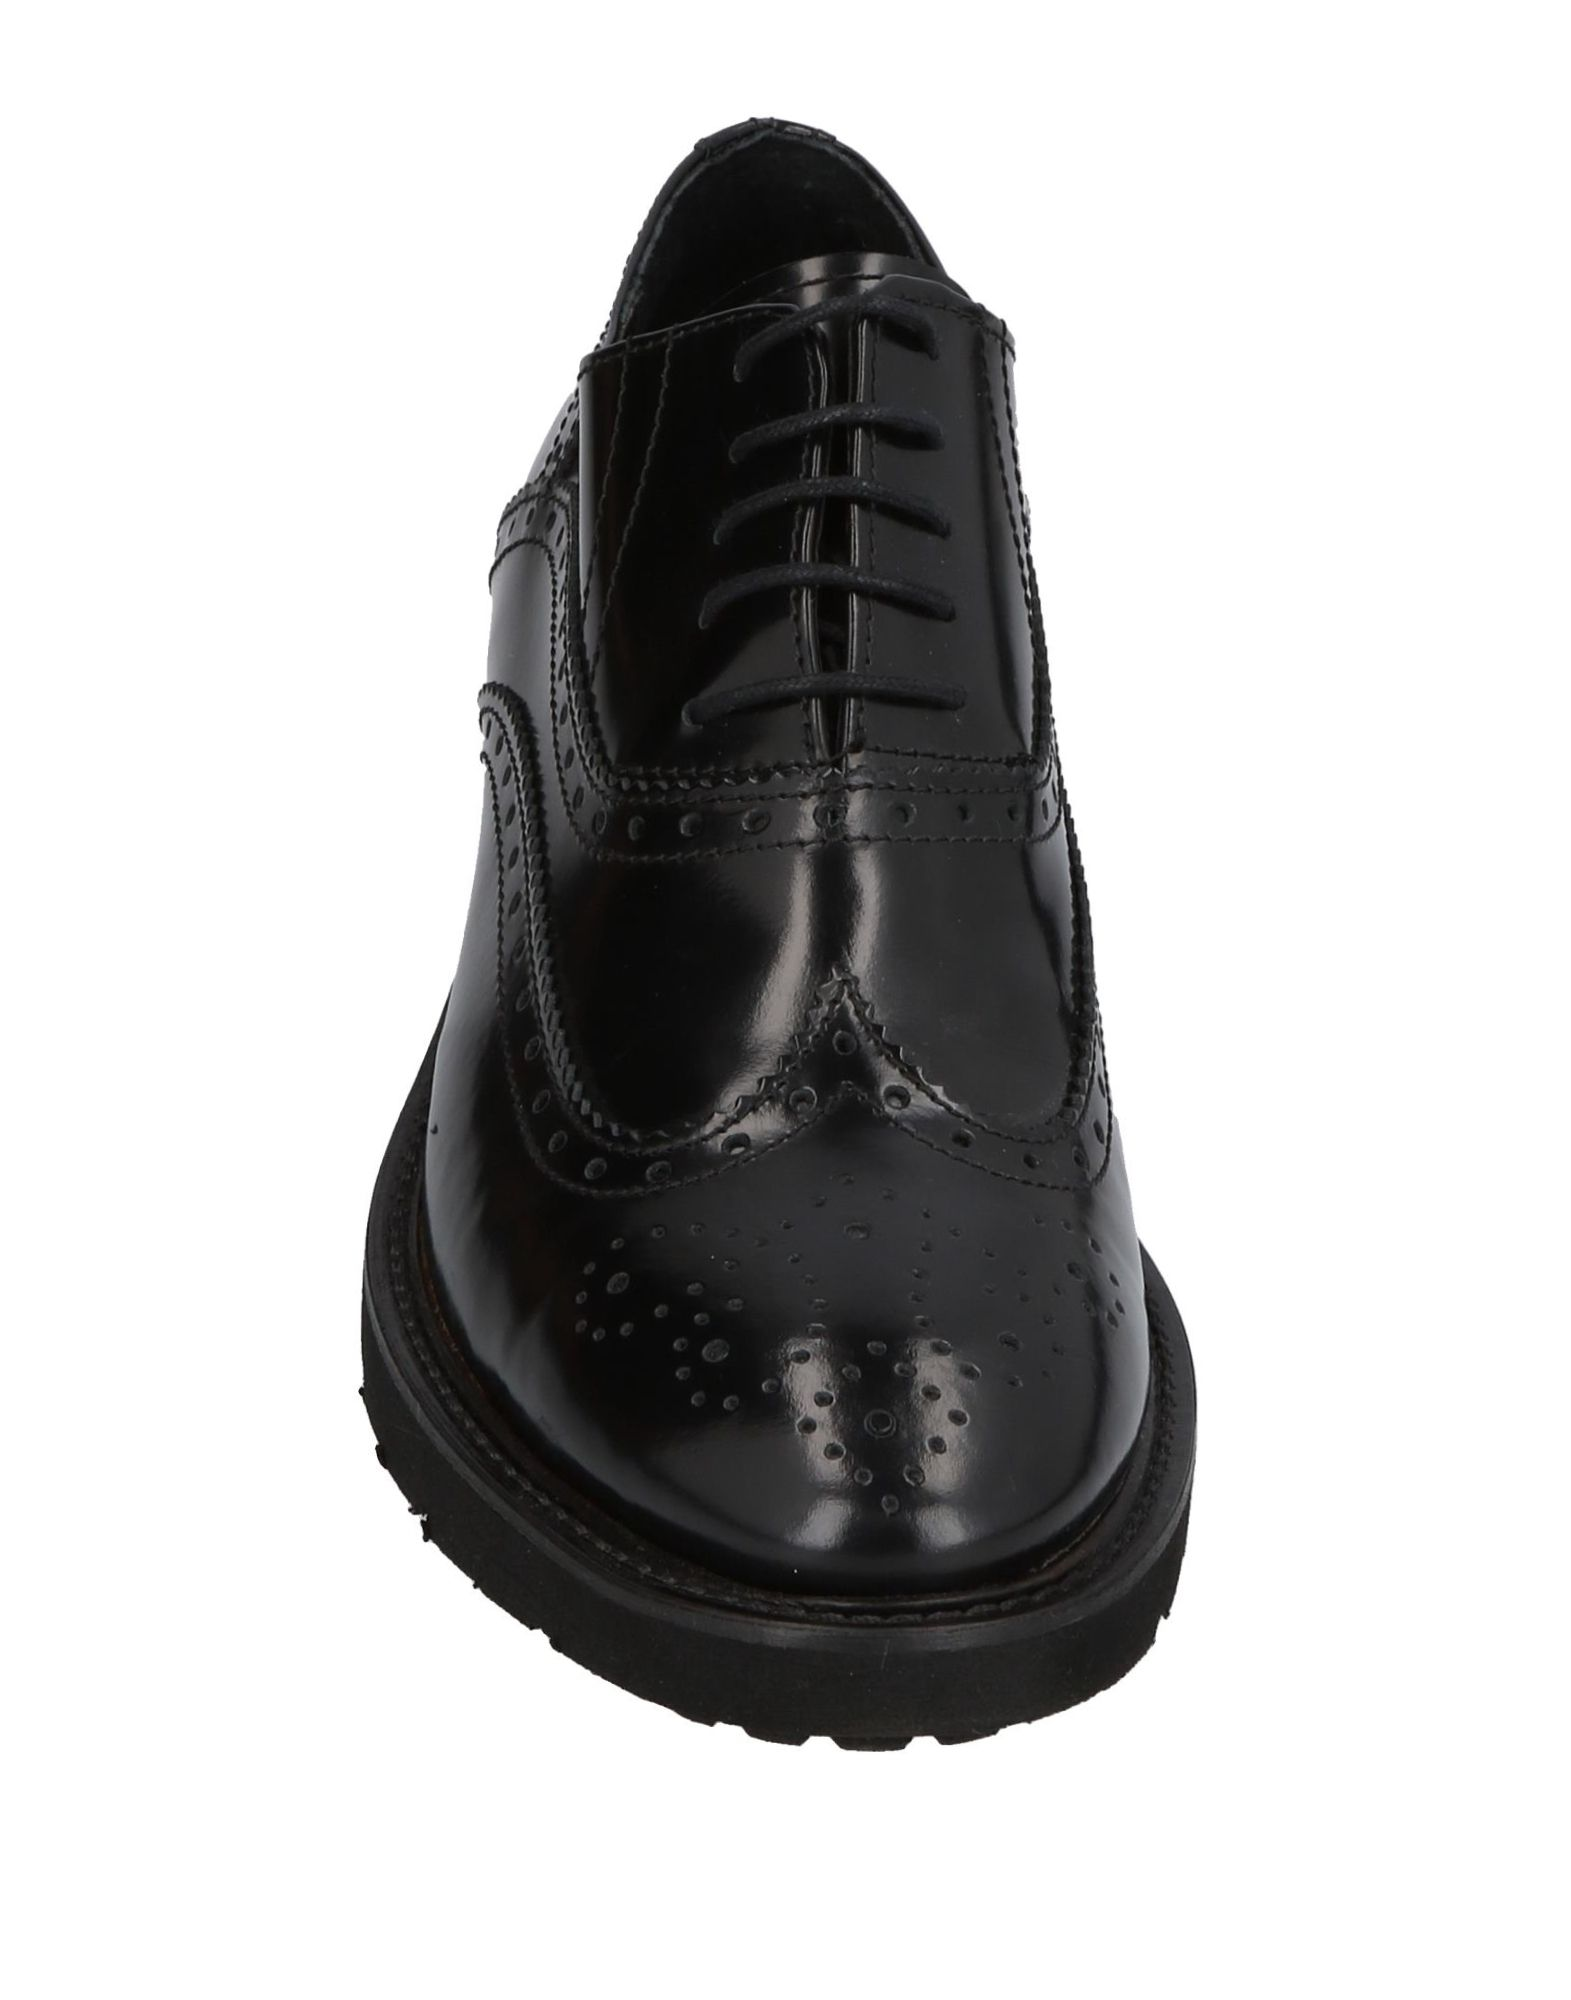 Stilvolle billige Schuhe Red Creatyve 11458145VV Schnürschuhe Damen  11458145VV Creatyve 3ece5e